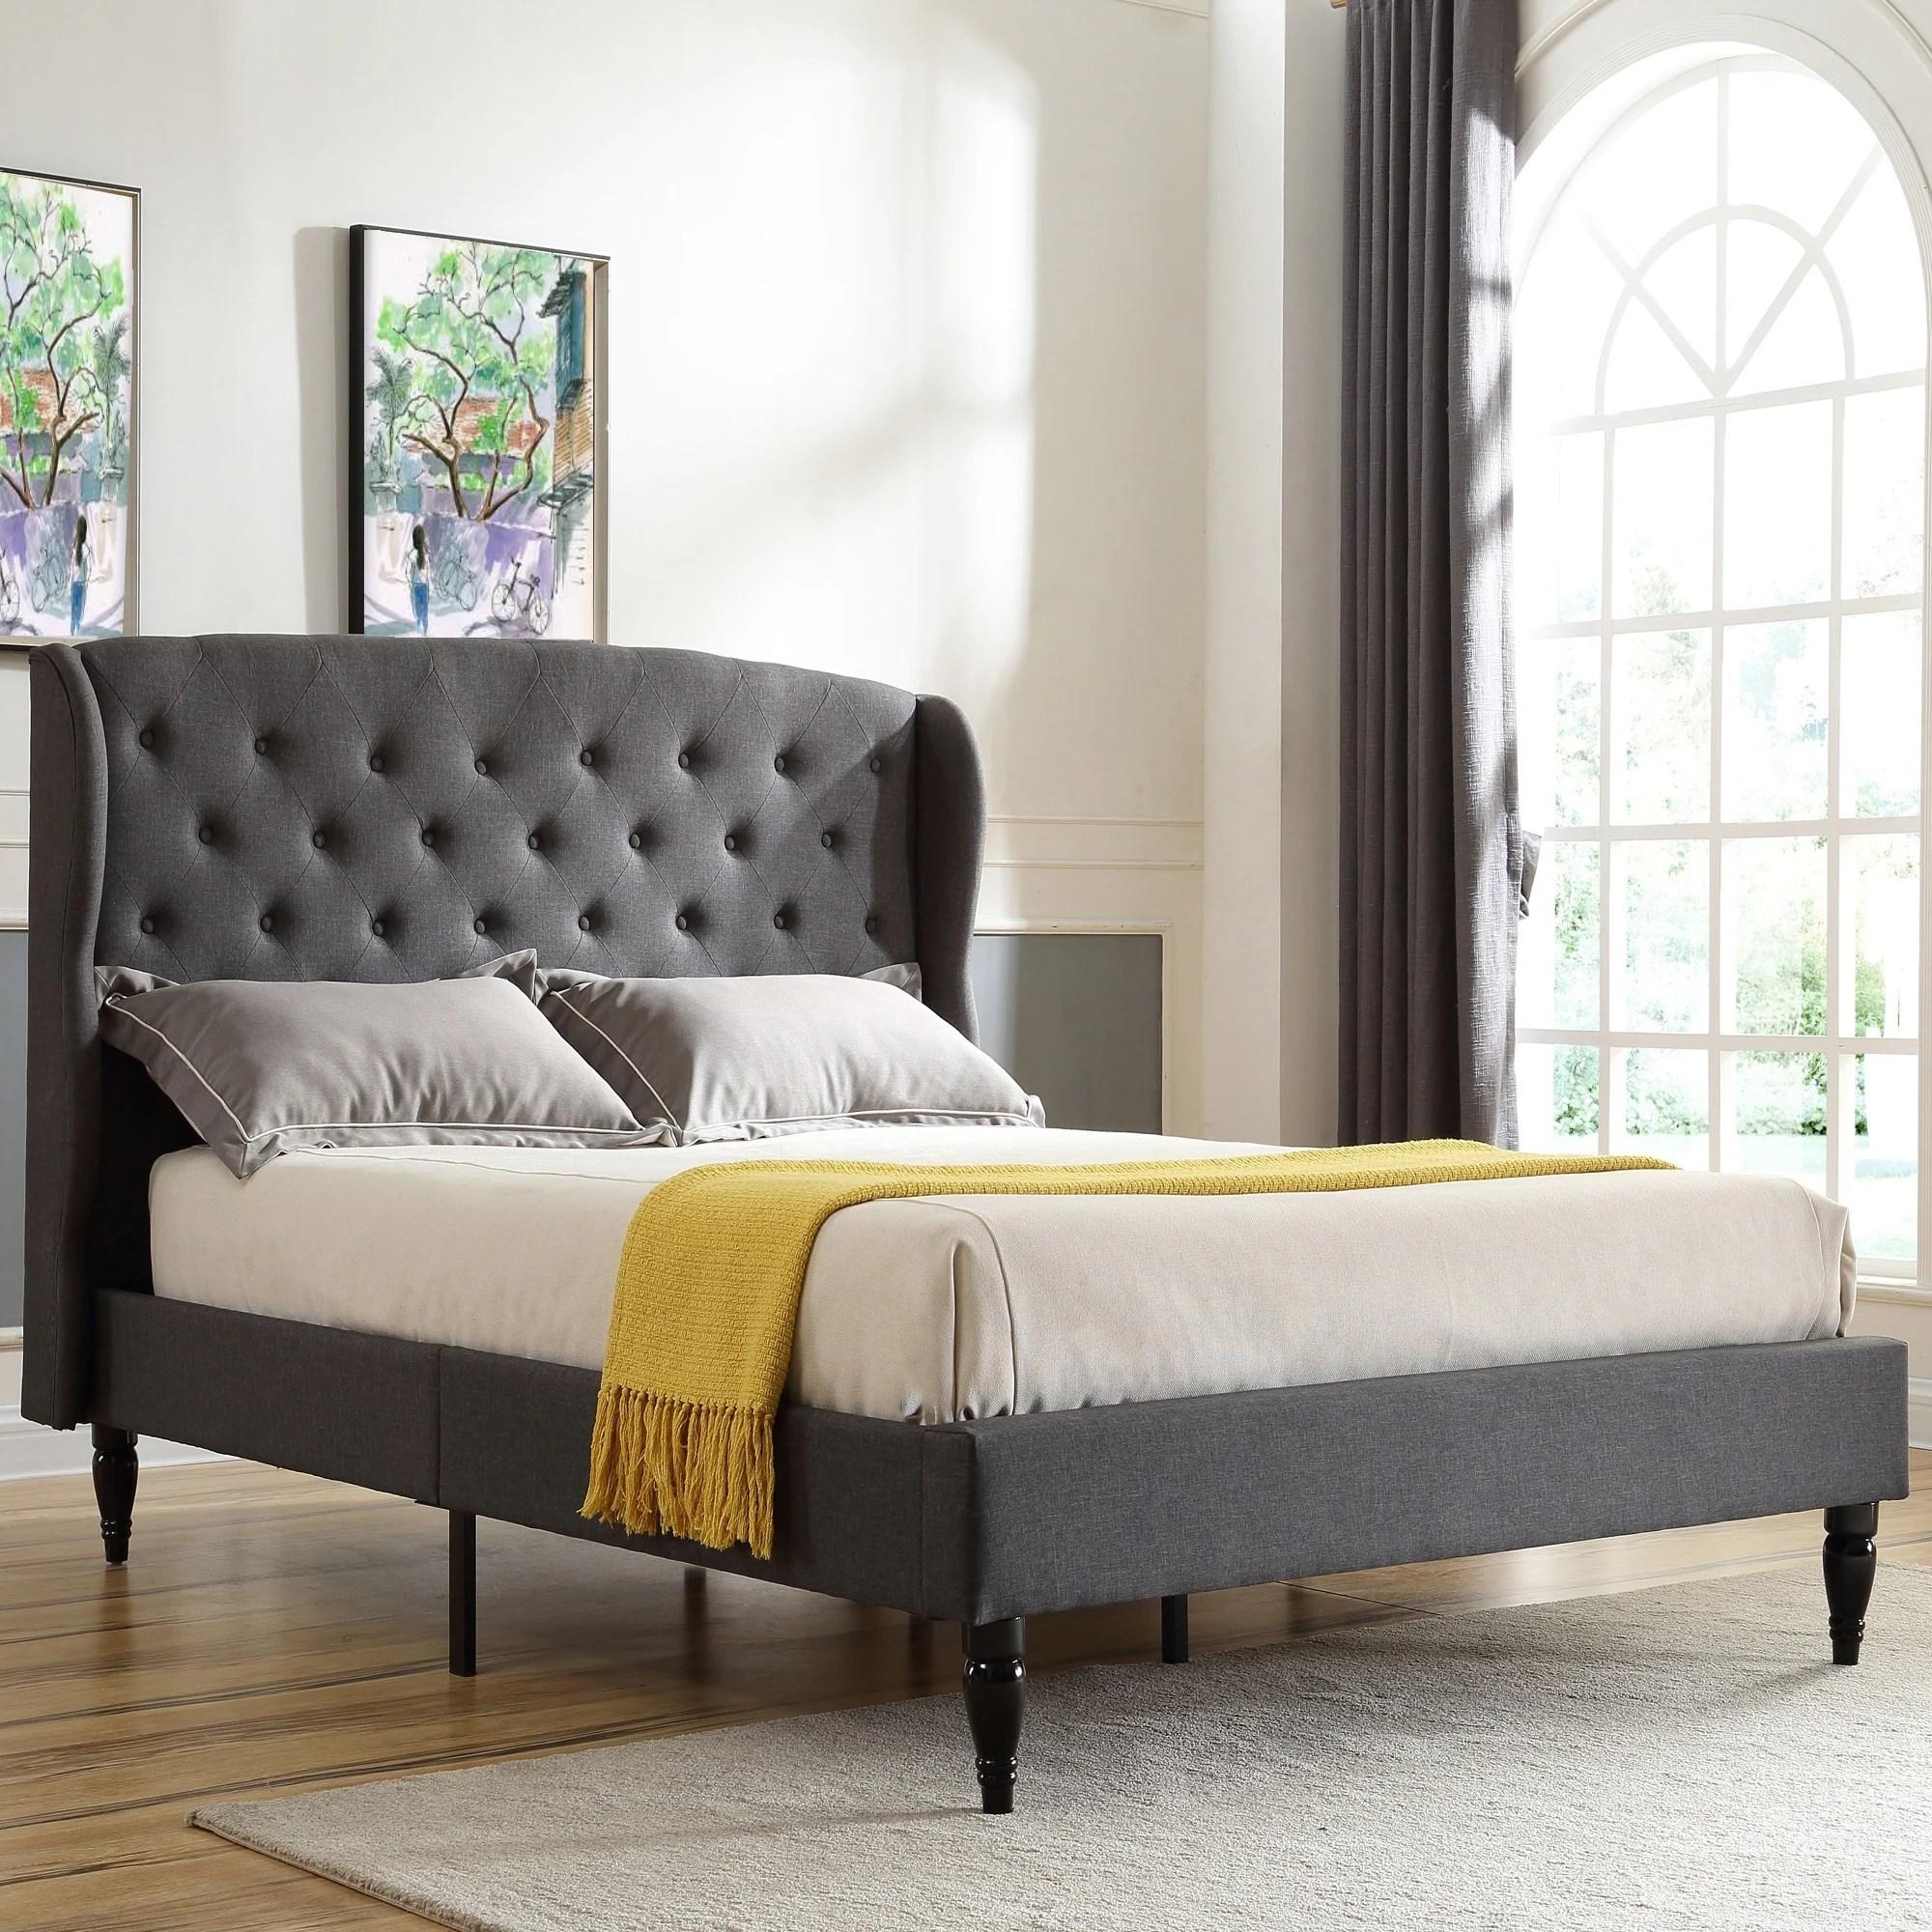 Shop Black Friday Deals On Classic Brands Coventry Upholstered Platform Bed Metal Frame With Wood Slat Support Overstock 21502480